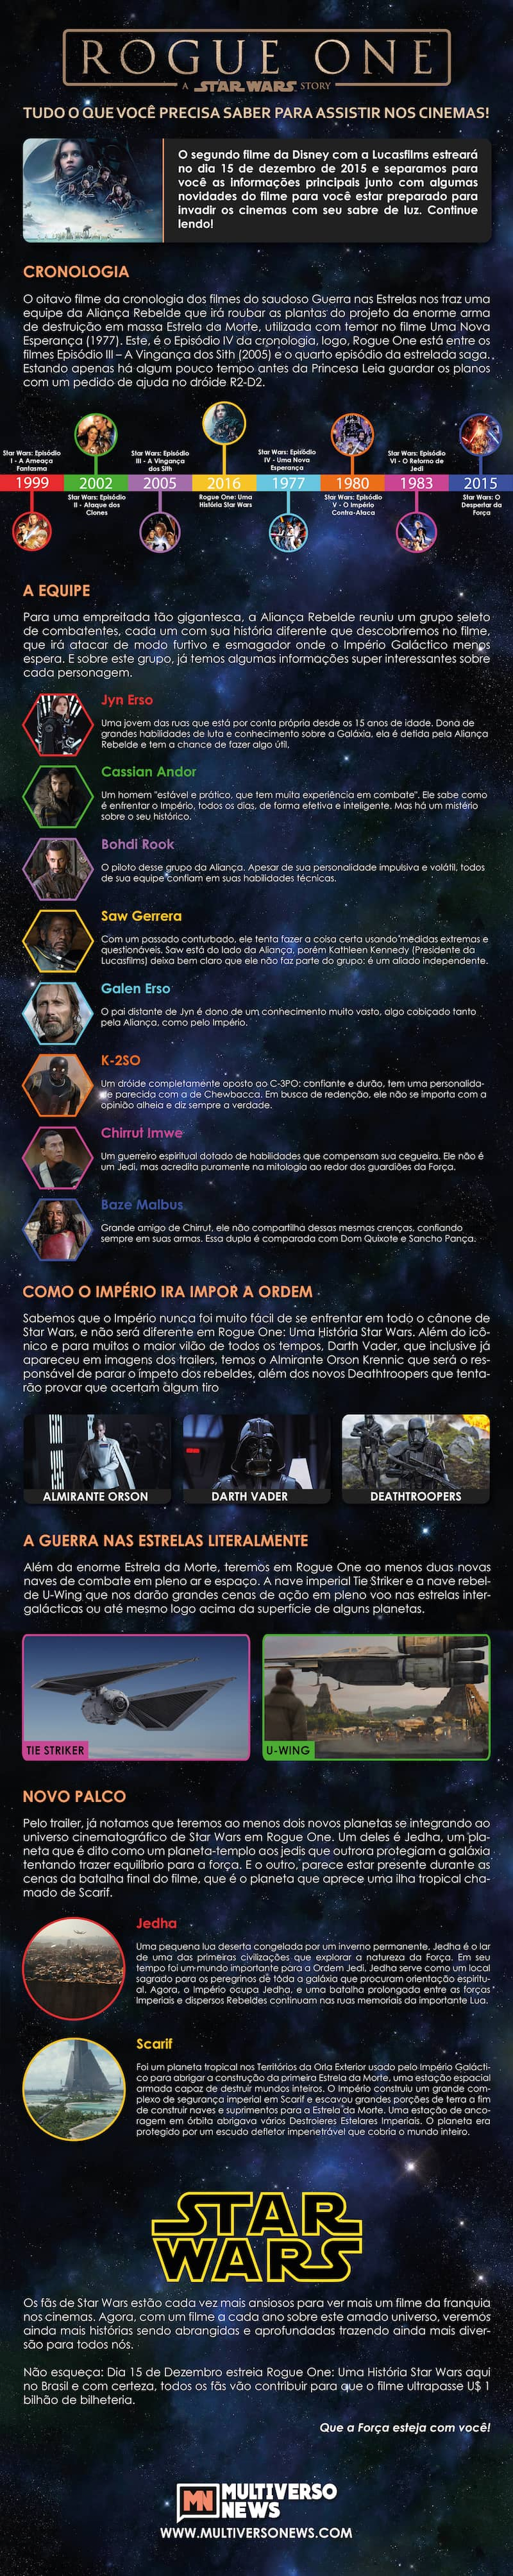 infografico-rogue-one